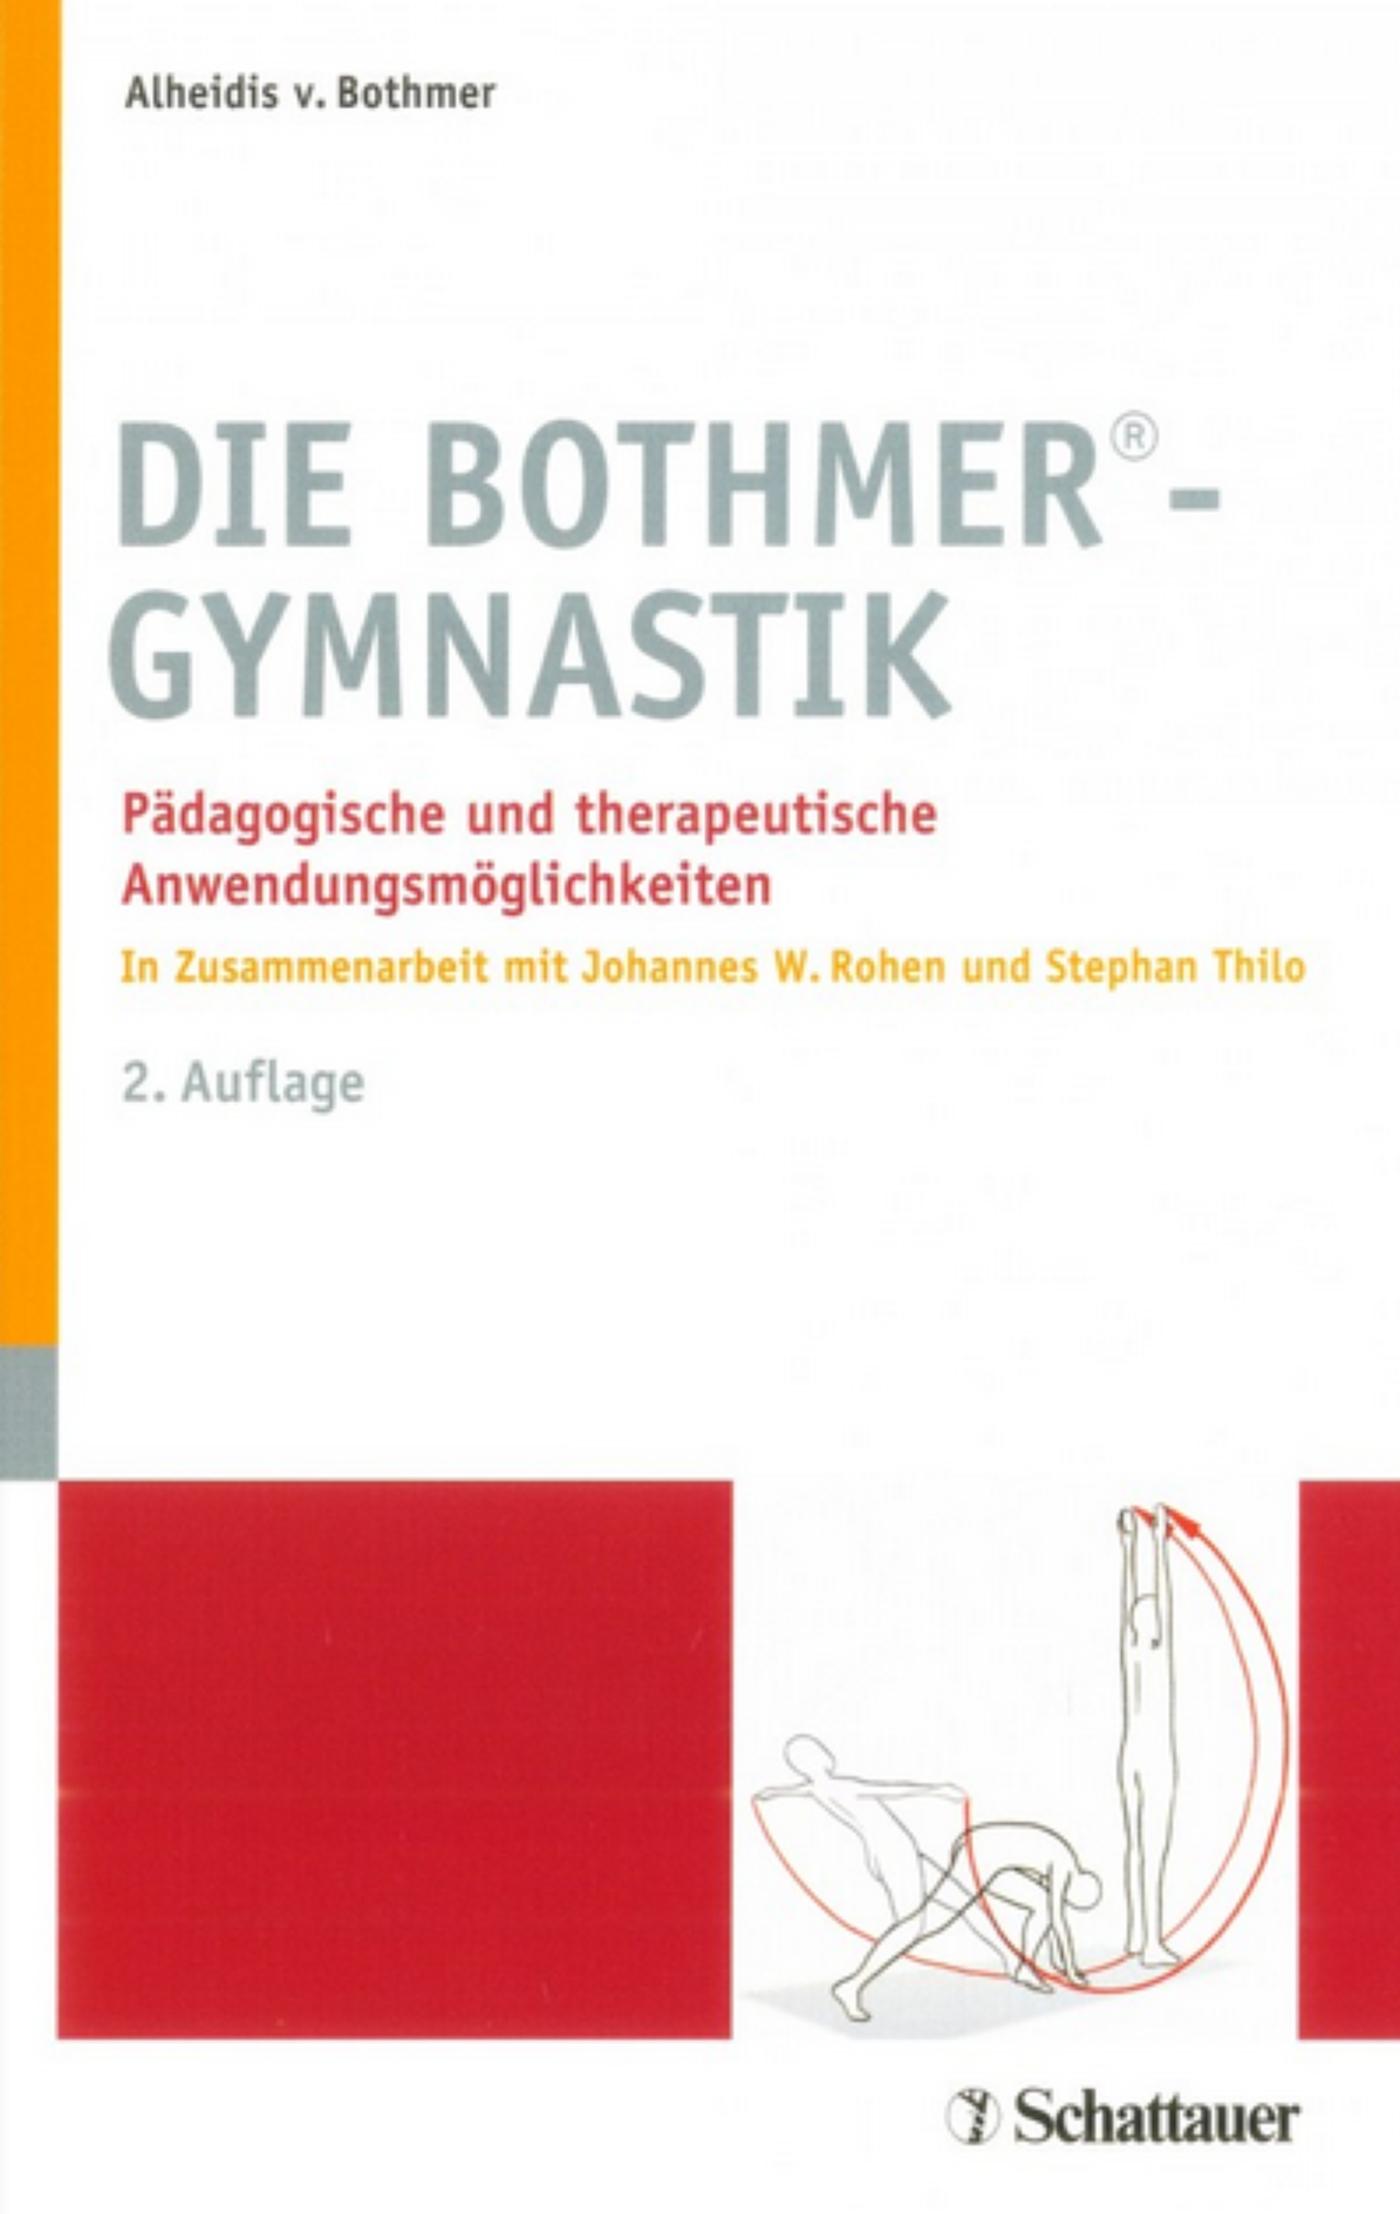 Die Bothmer Gymnastik